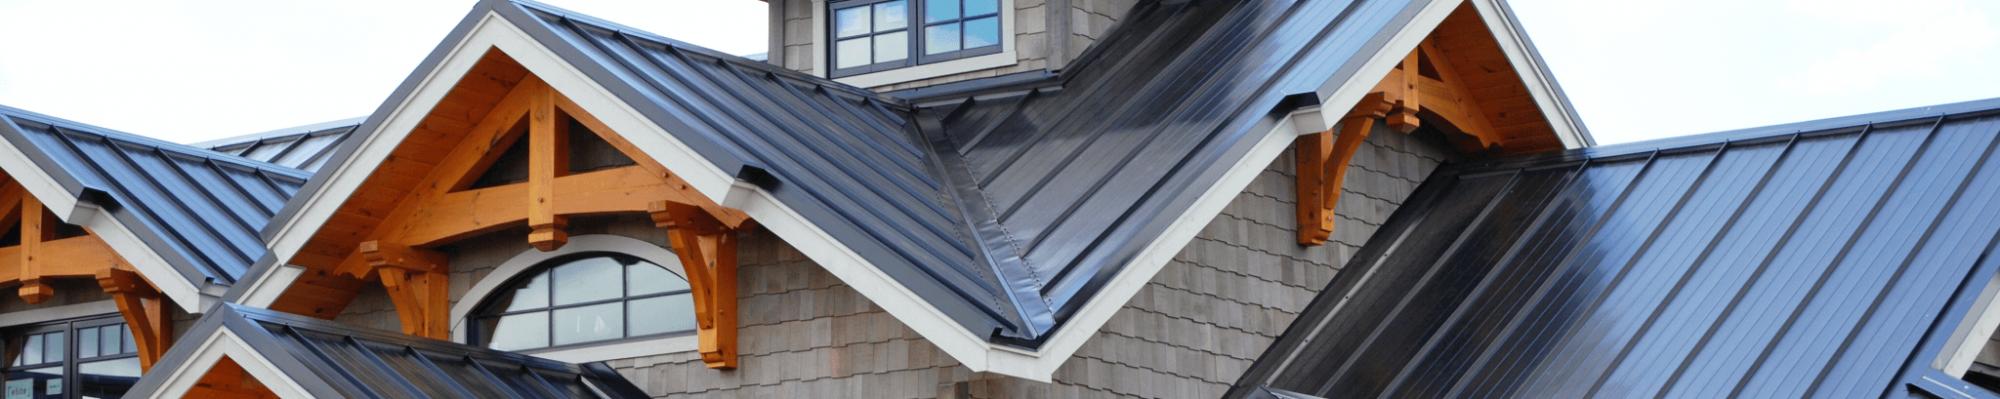 Edan WCC Roofing